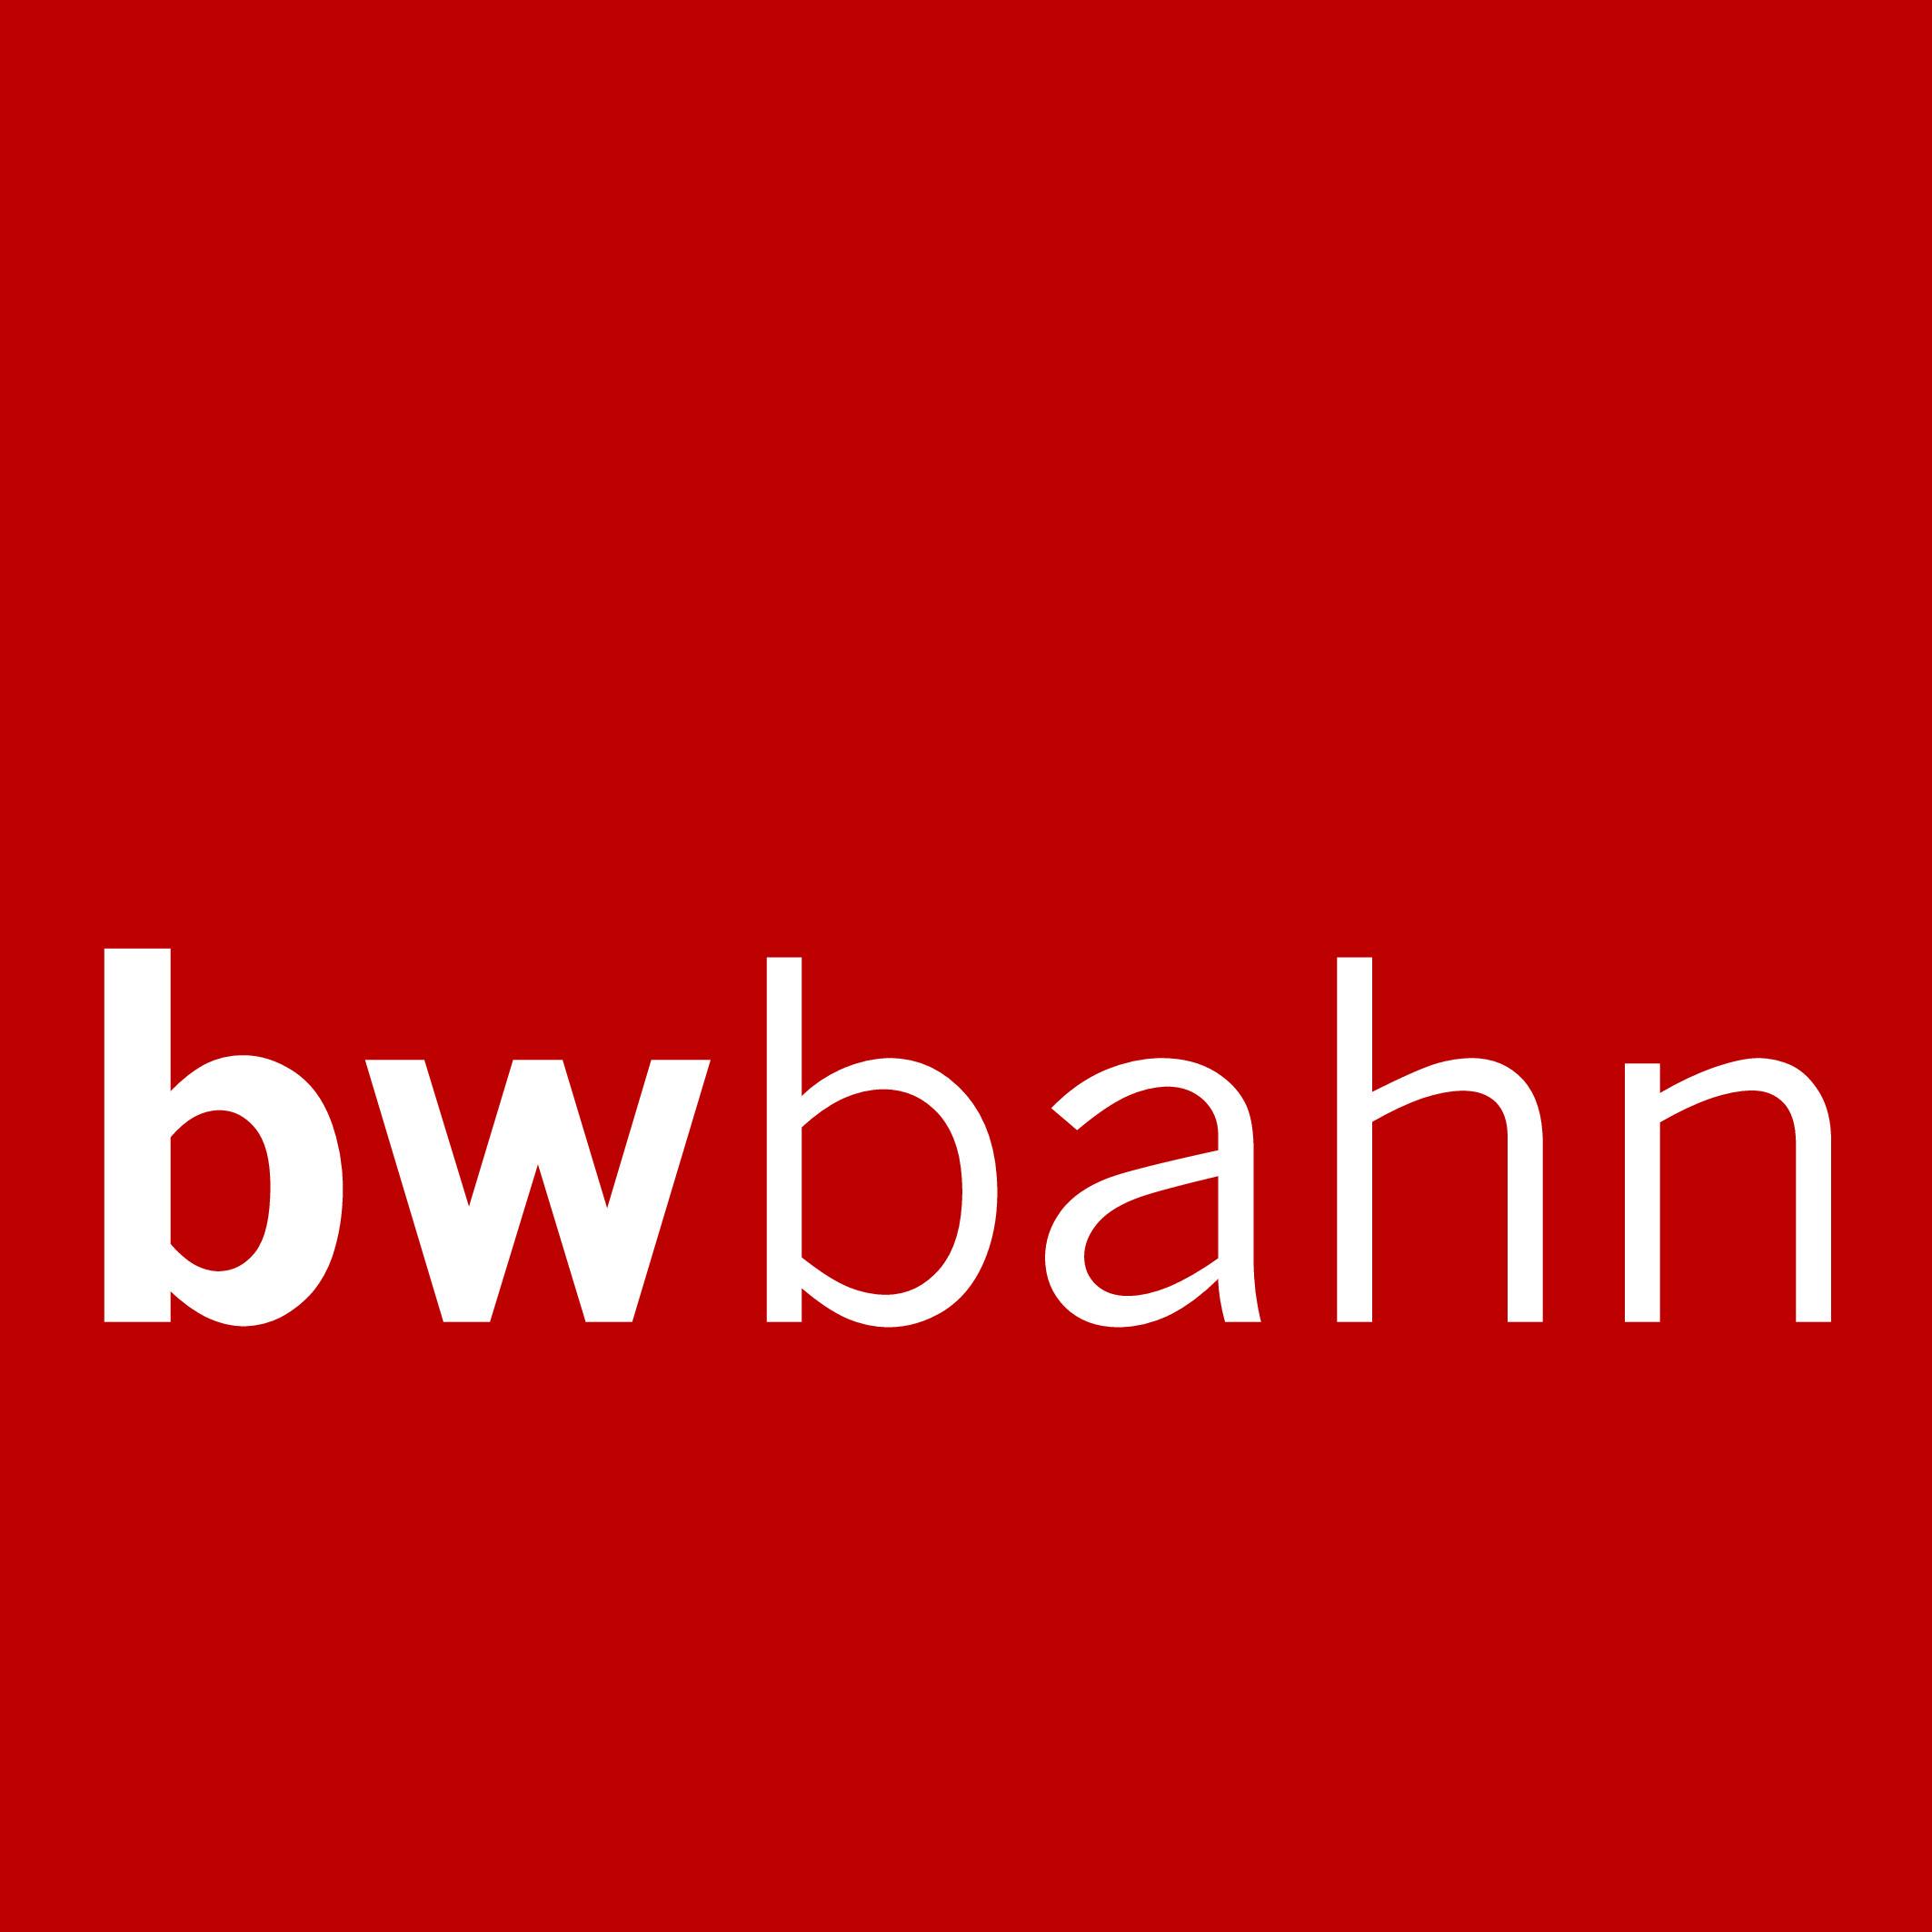 bwbahn - Ihr großer Modellbahnhändler